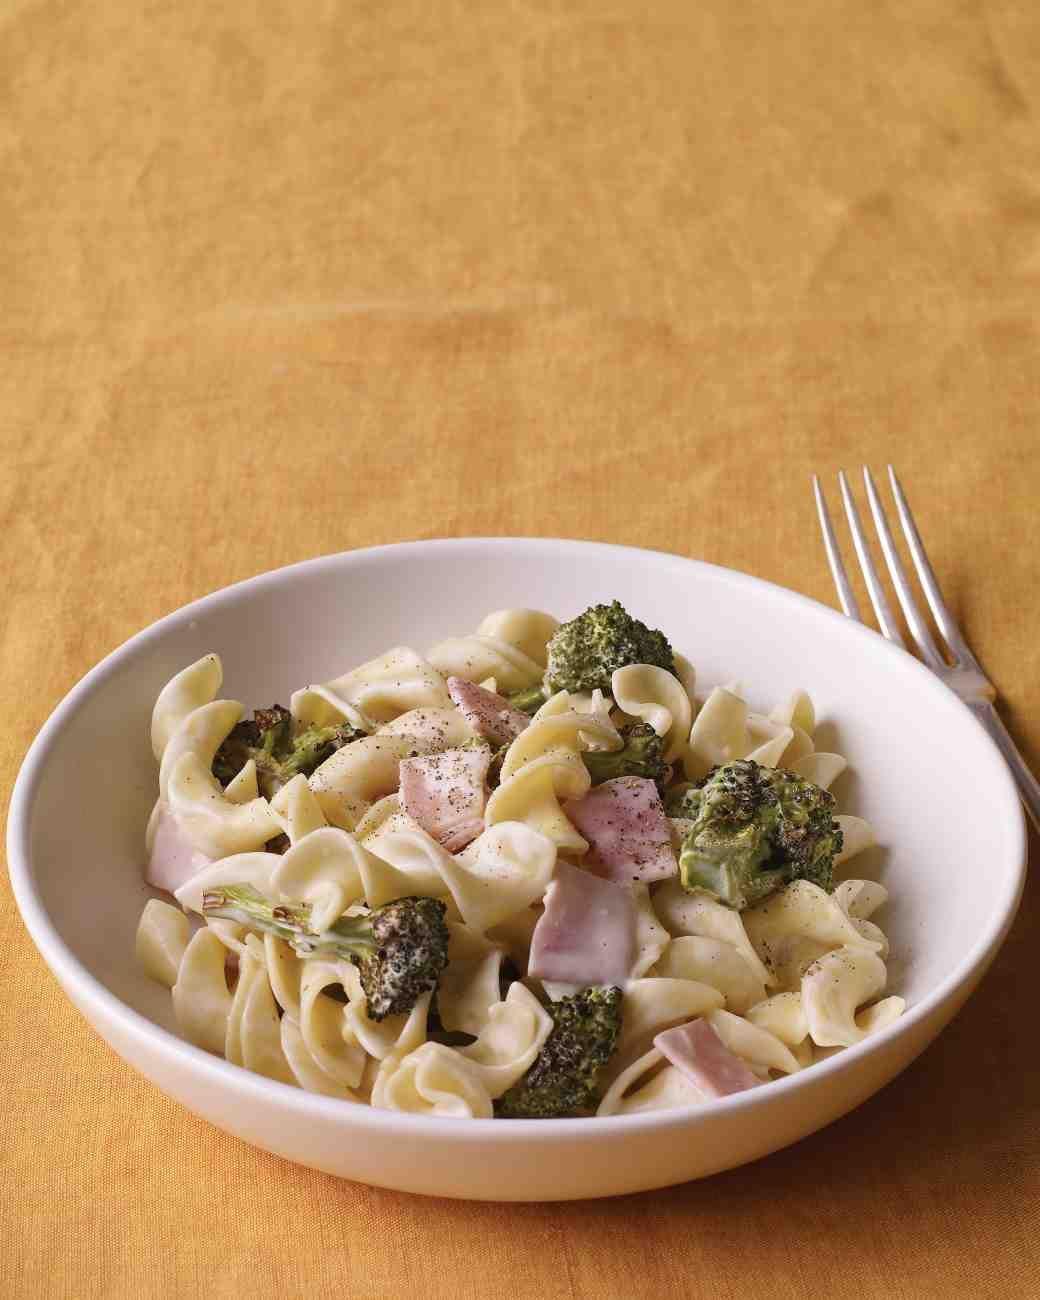 Creamy Pasta with Ham and Broccoli